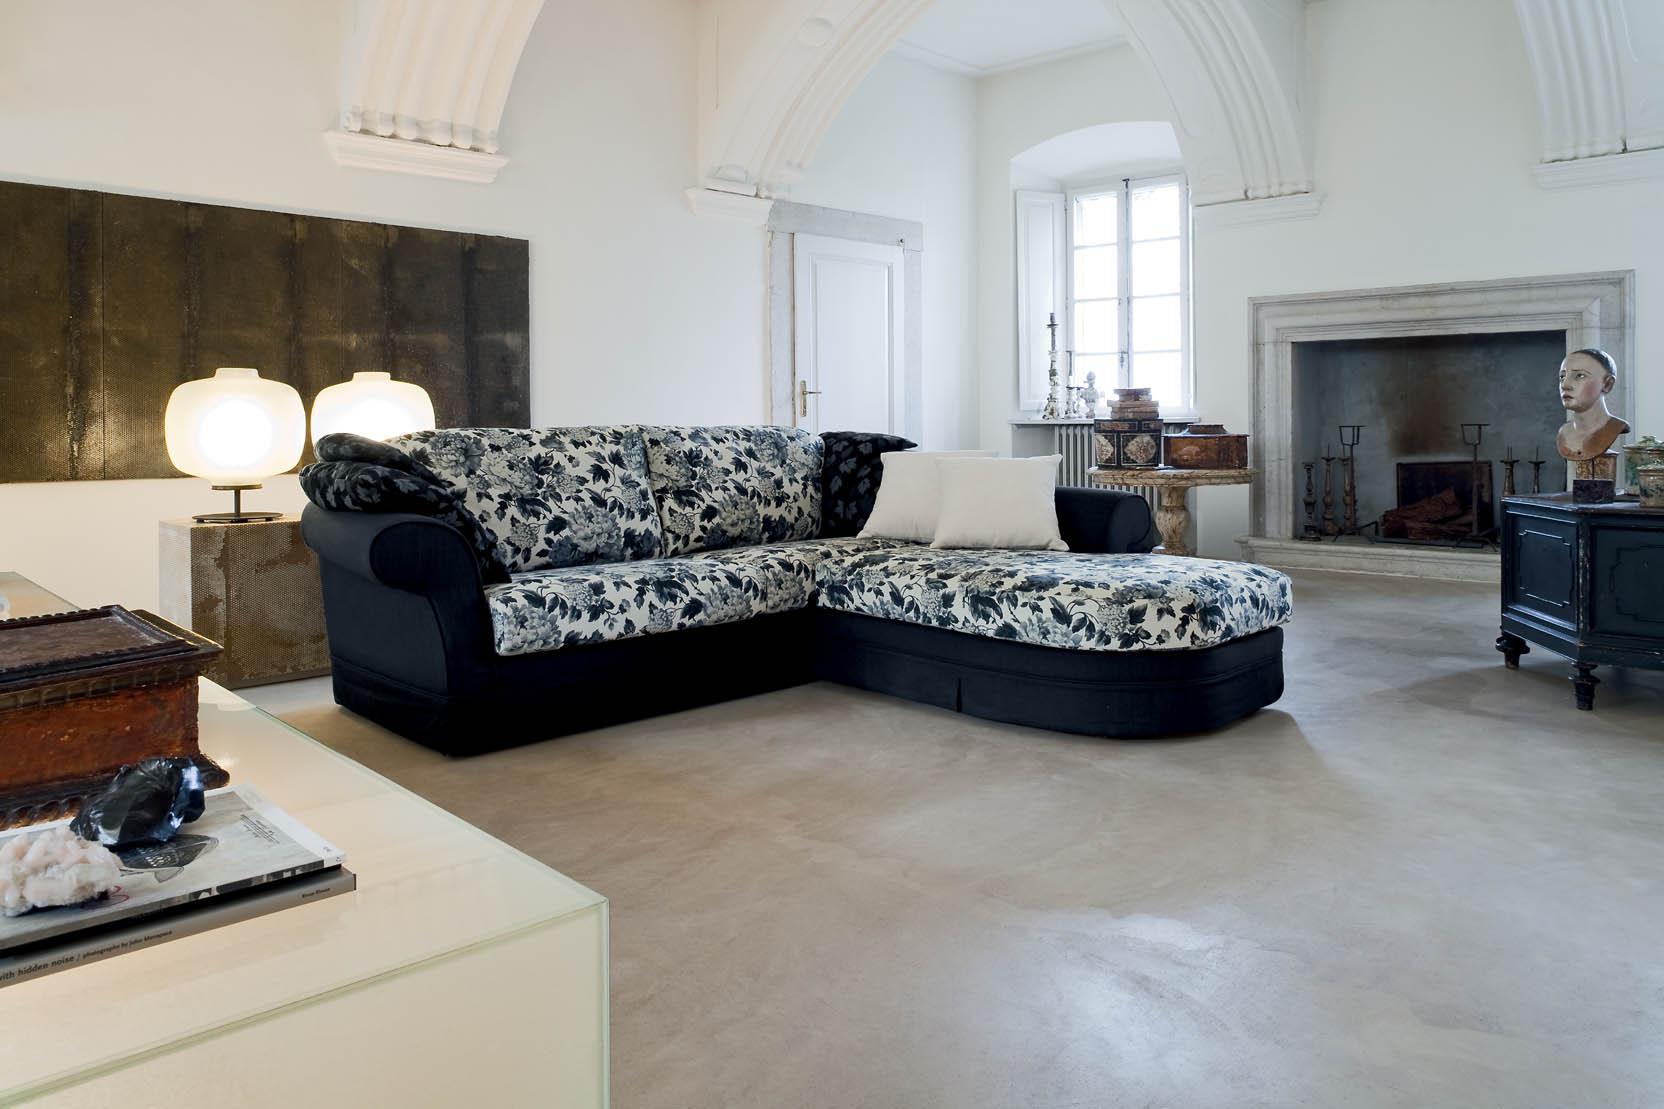 Divano Tessuto Floreale : Divano modello soffio